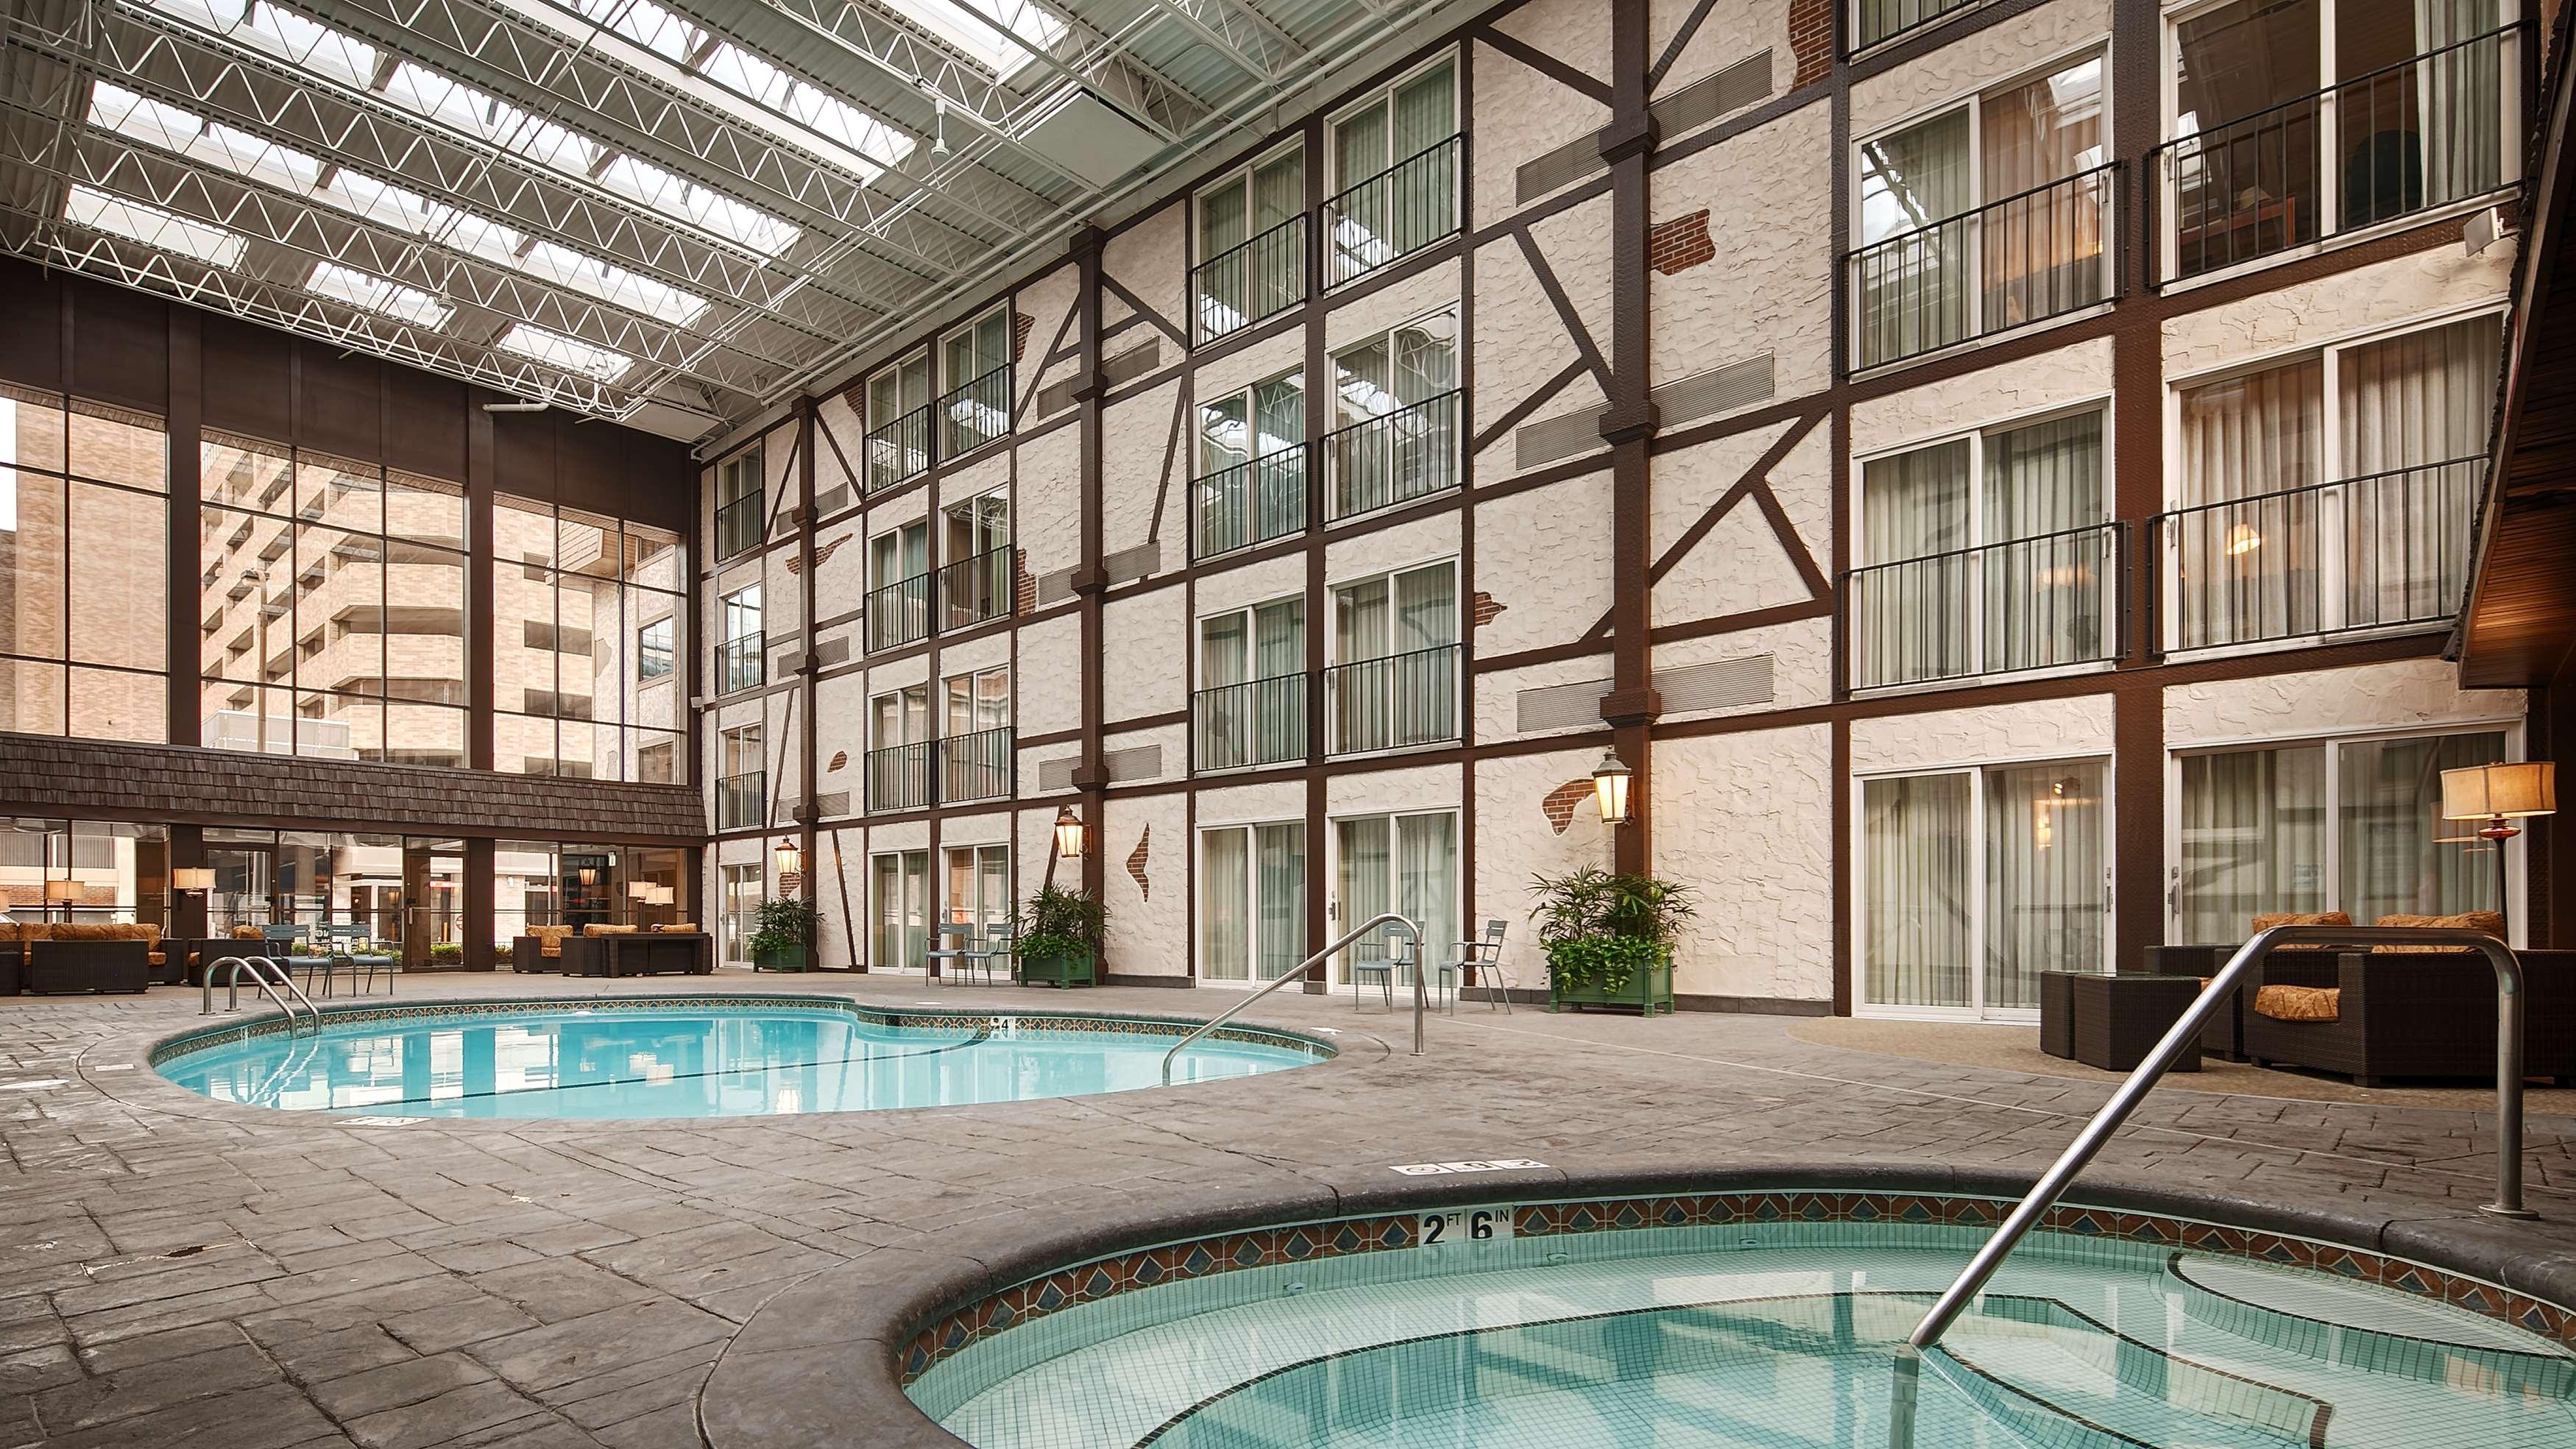 Best Western Plus The Normandy Inn & Suites image 13